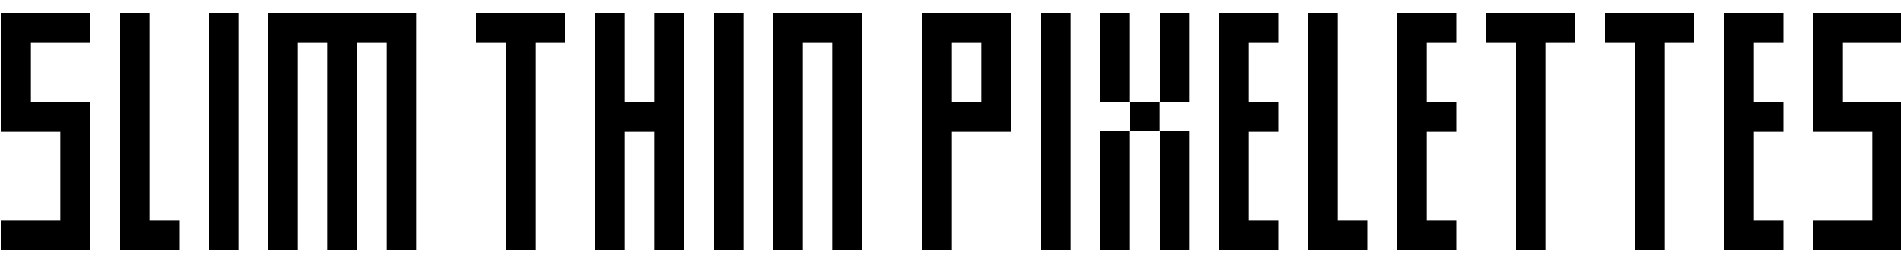 Slim thin pixelettes